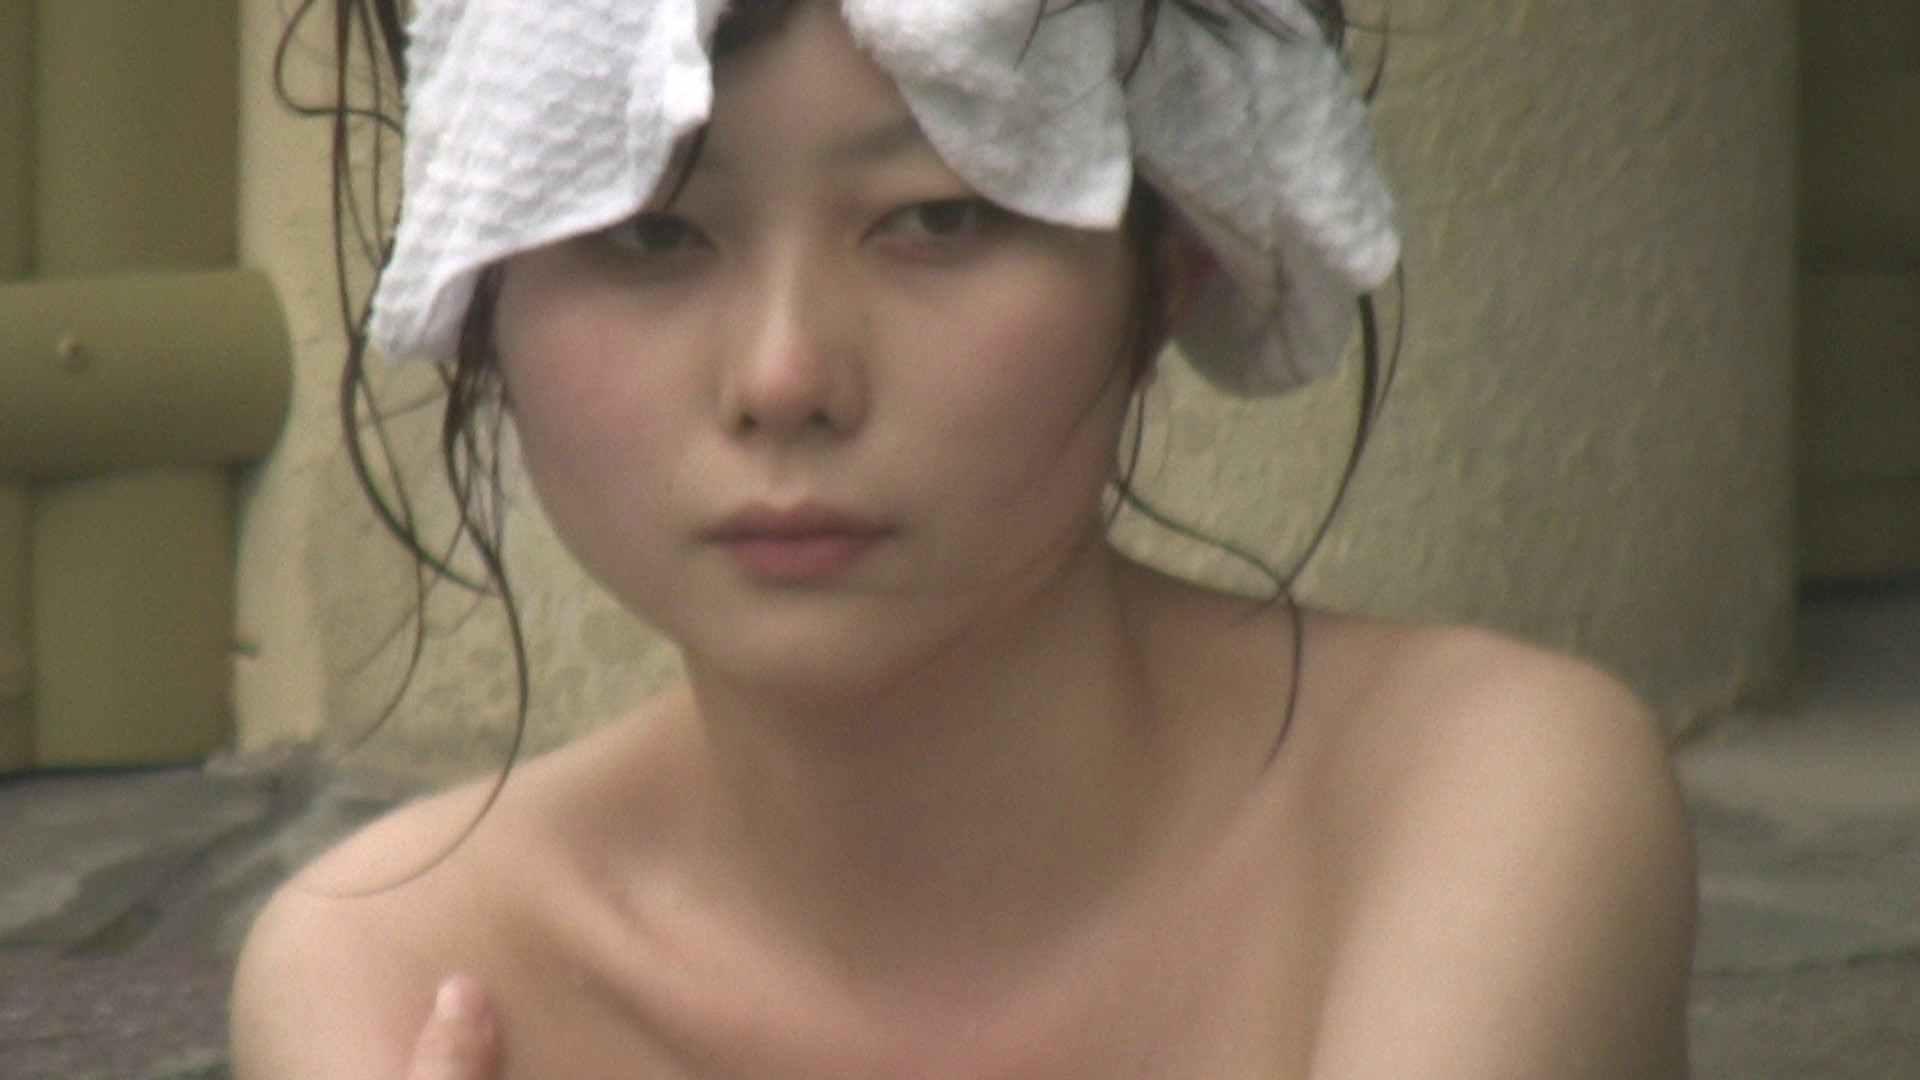 Aquaな露天風呂Vol.147 綺麗なOLたち アダルト動画キャプチャ 102枚 89